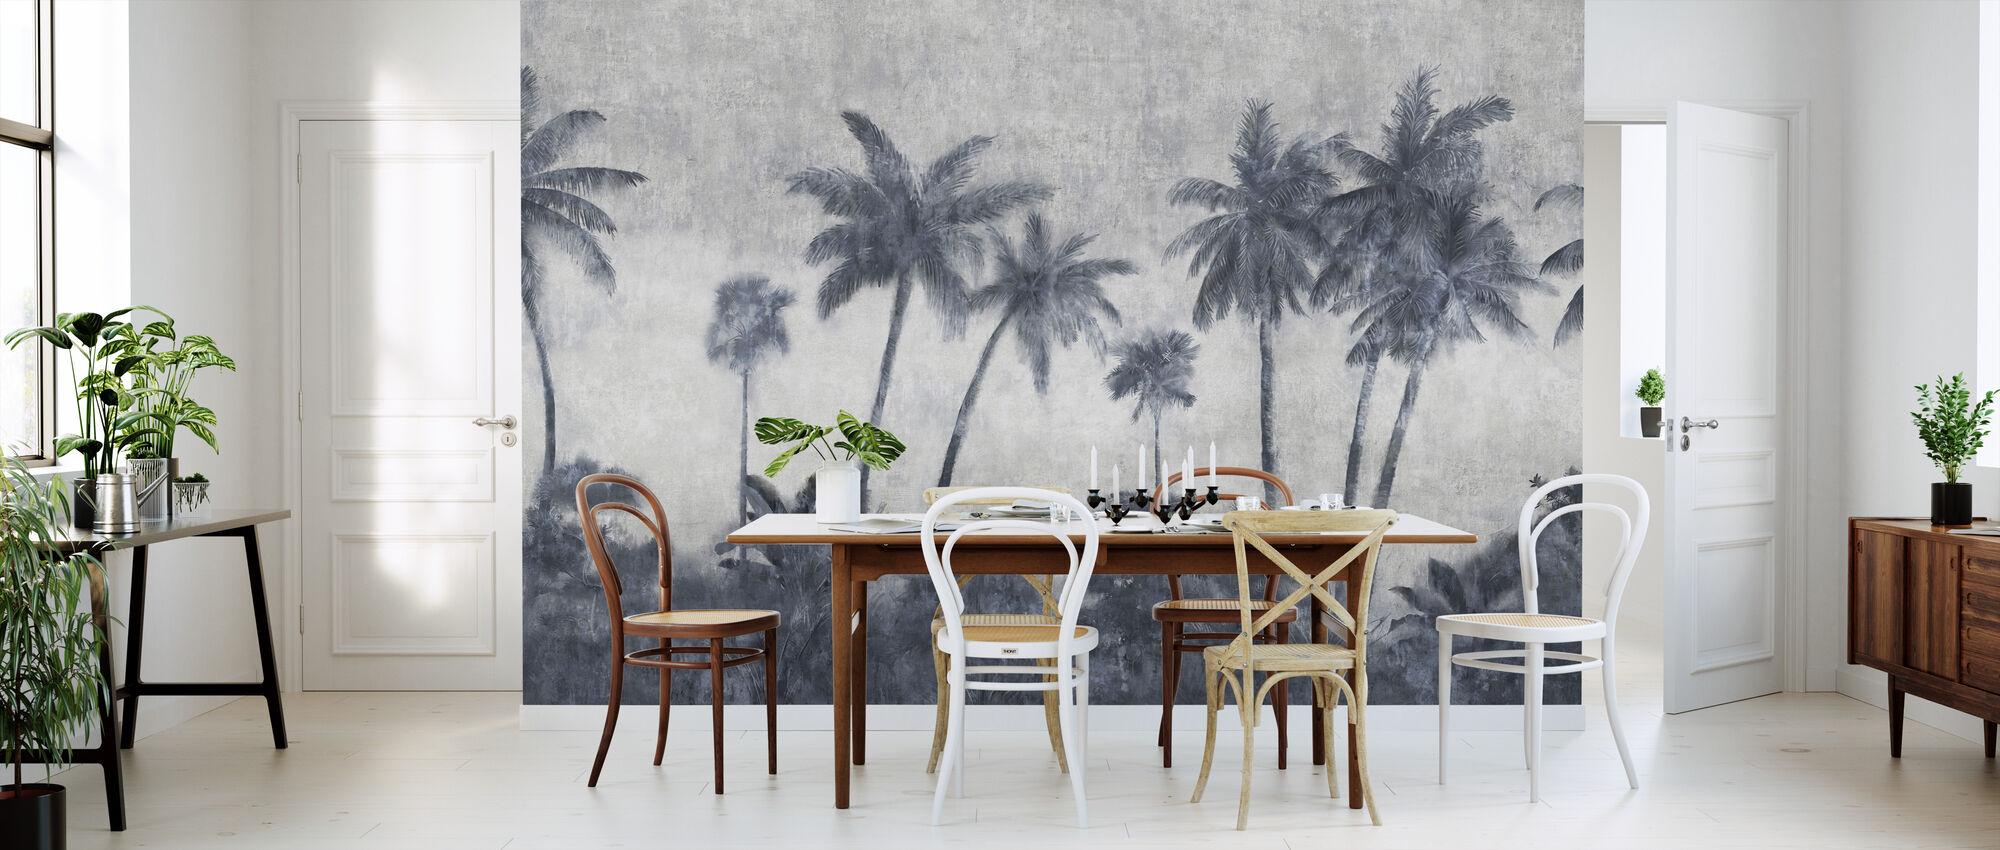 California Palmes op beton - Behang - Keuken